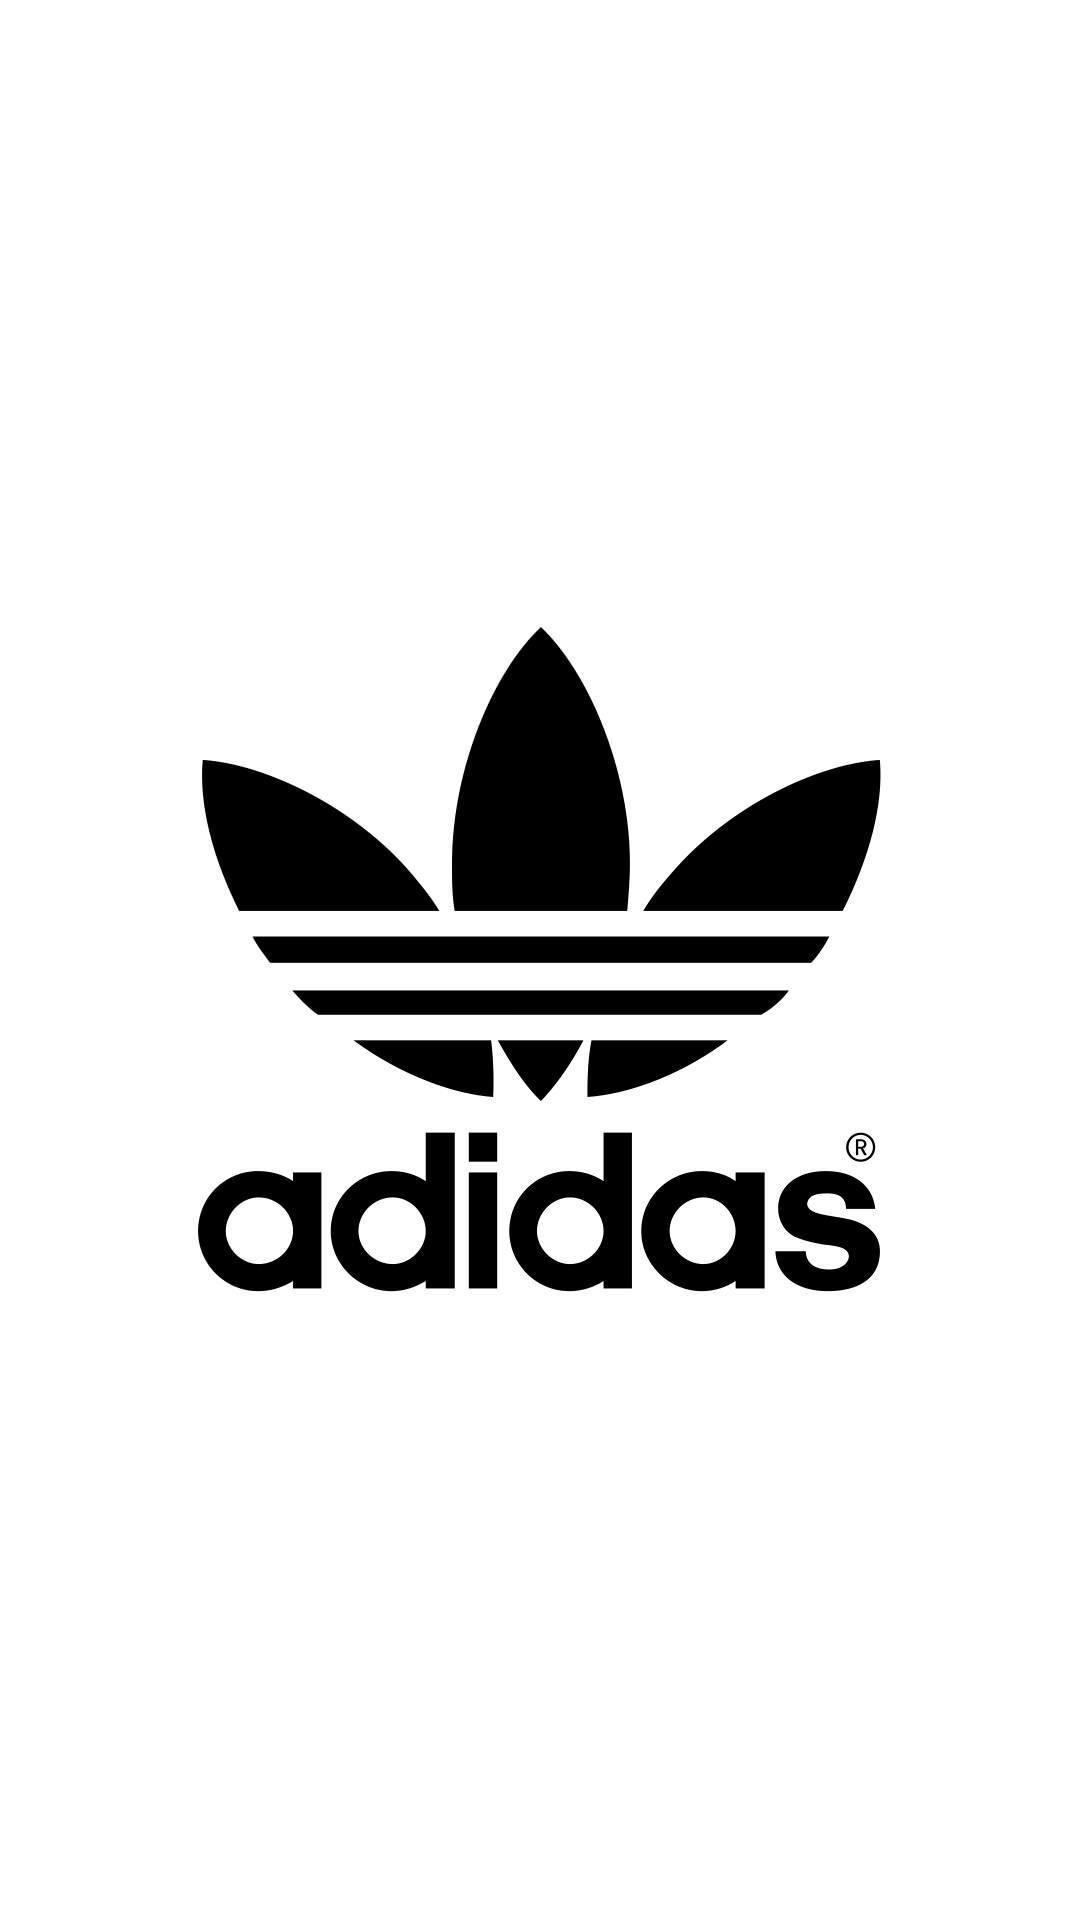 Black Adidas Logo Wallpapers   Top Black Adidas Logo 1080x1920